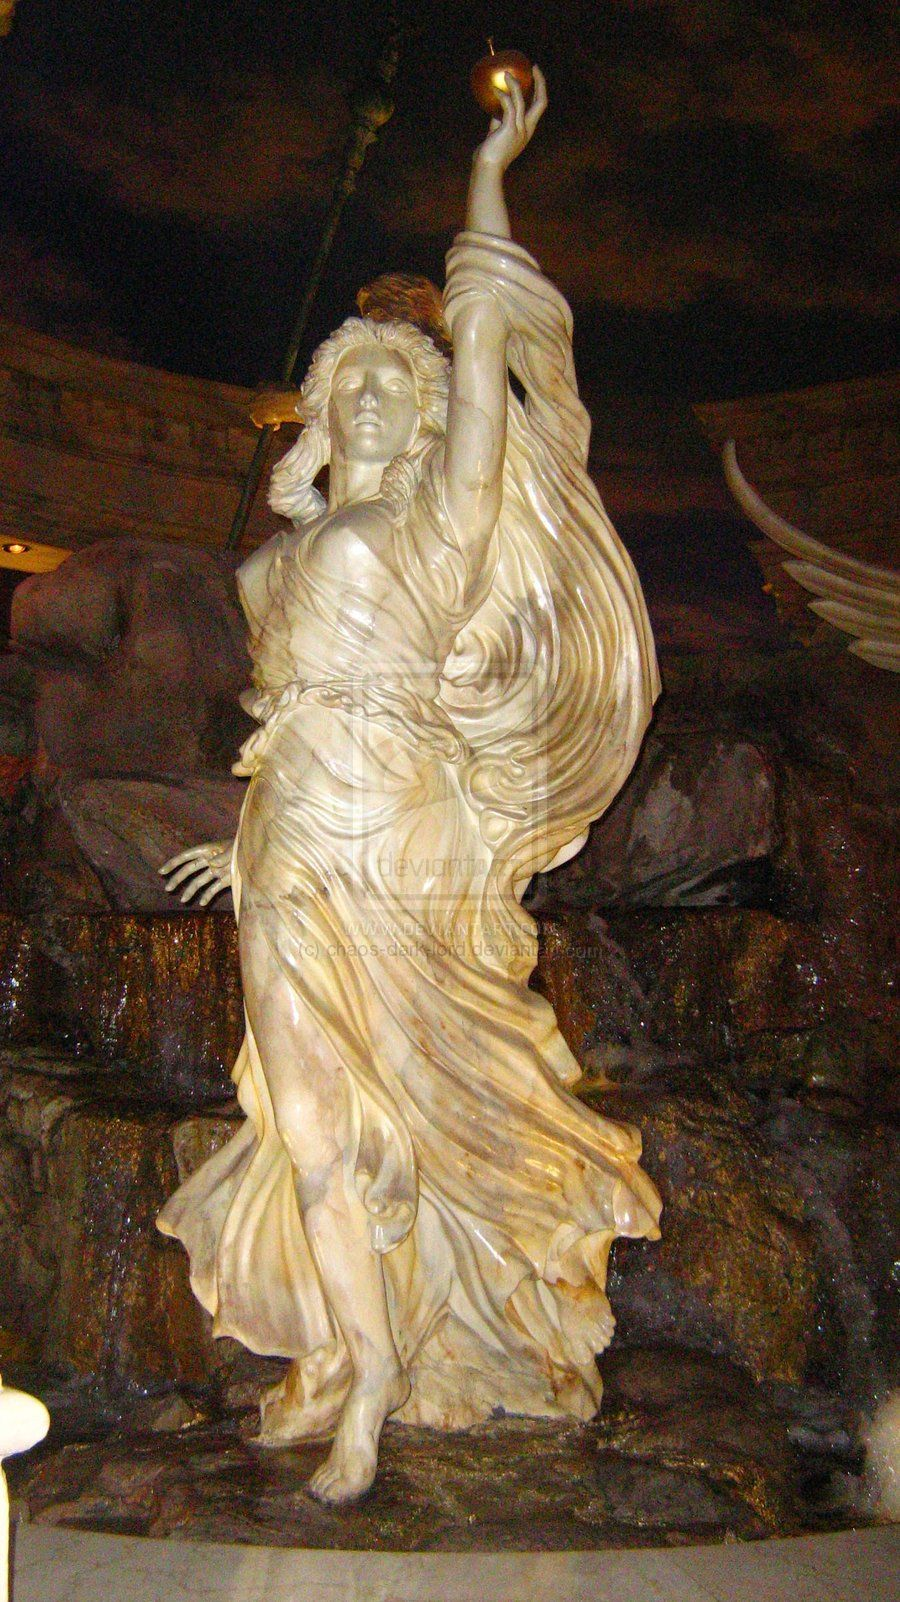 Ancient Gaia Statue eris goddess of discord statues | eris goddess of chaos and